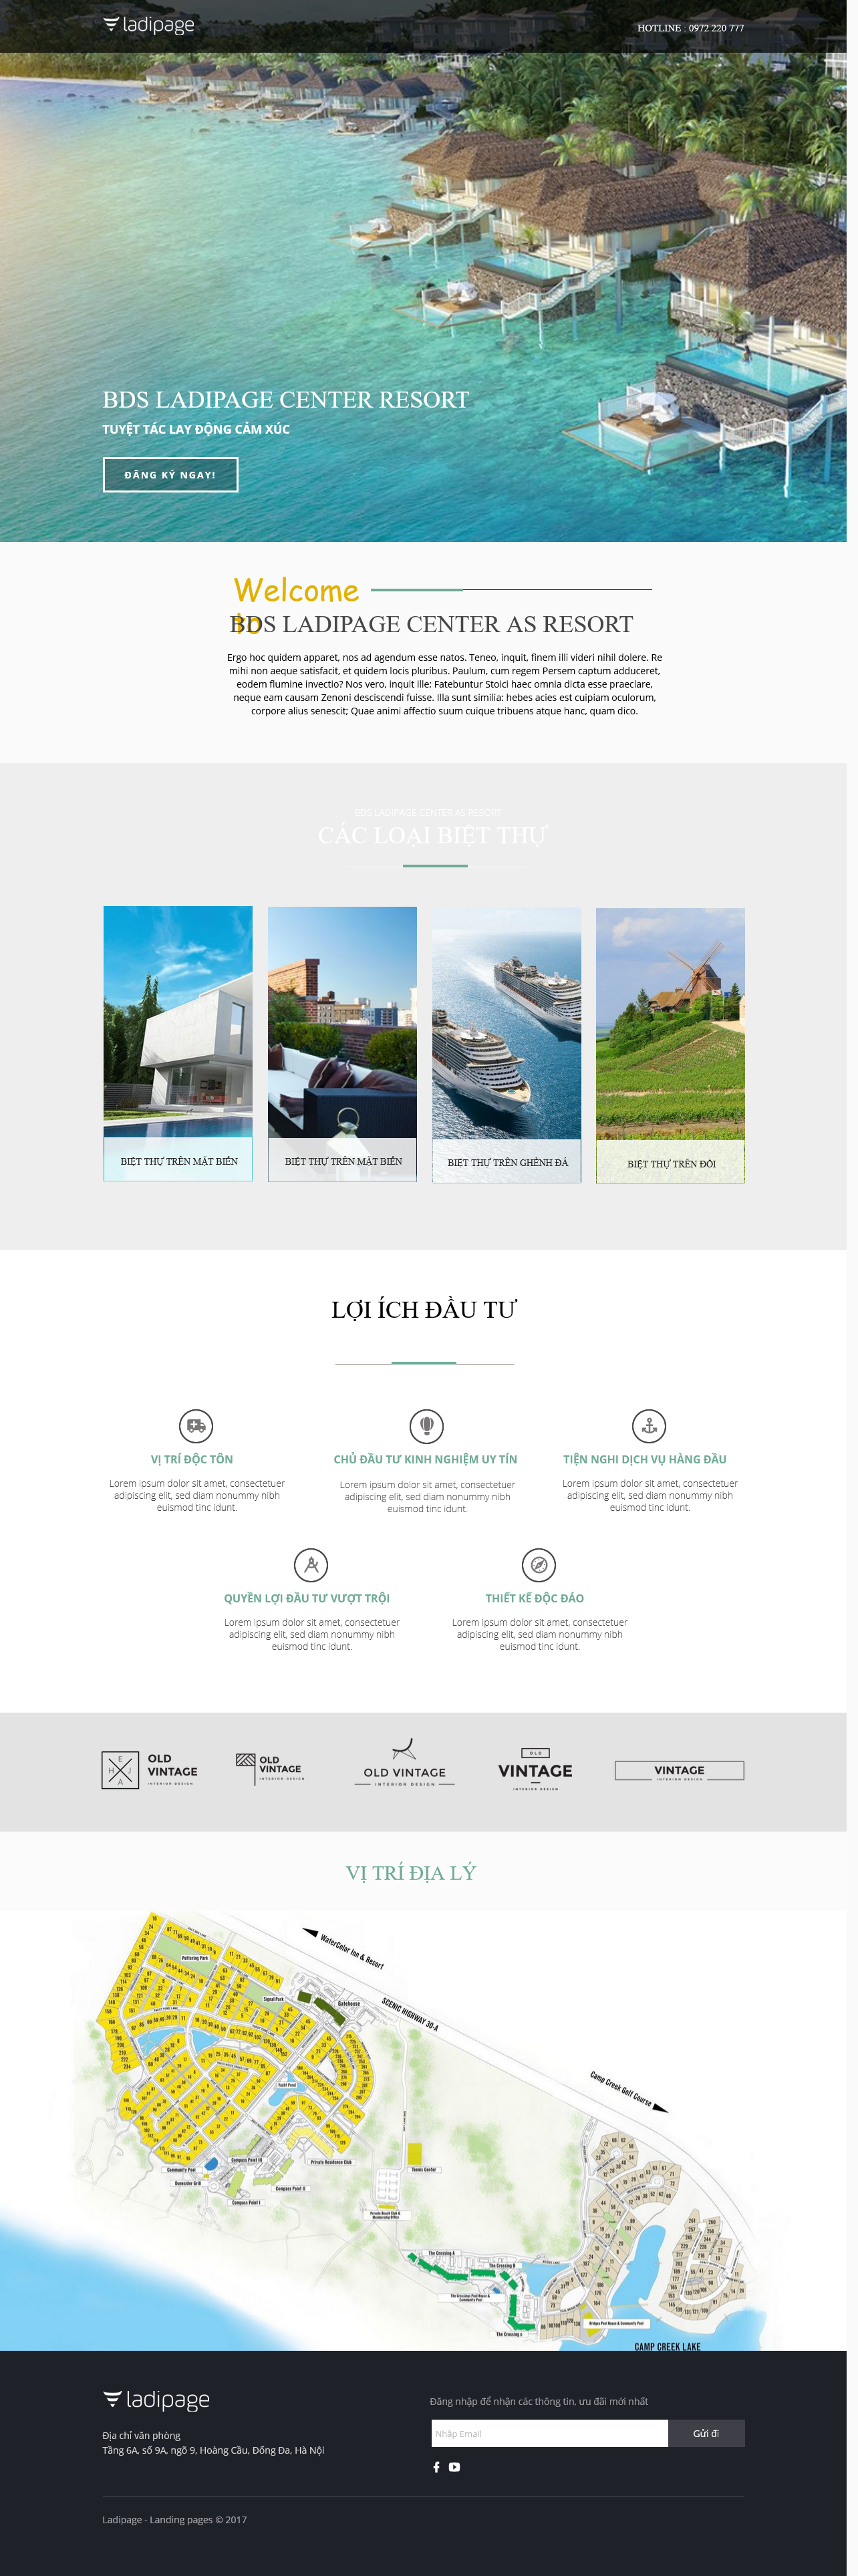 Thiết kế website Thiết kế webiste landingpage bat-dong-san Bất động sản 21